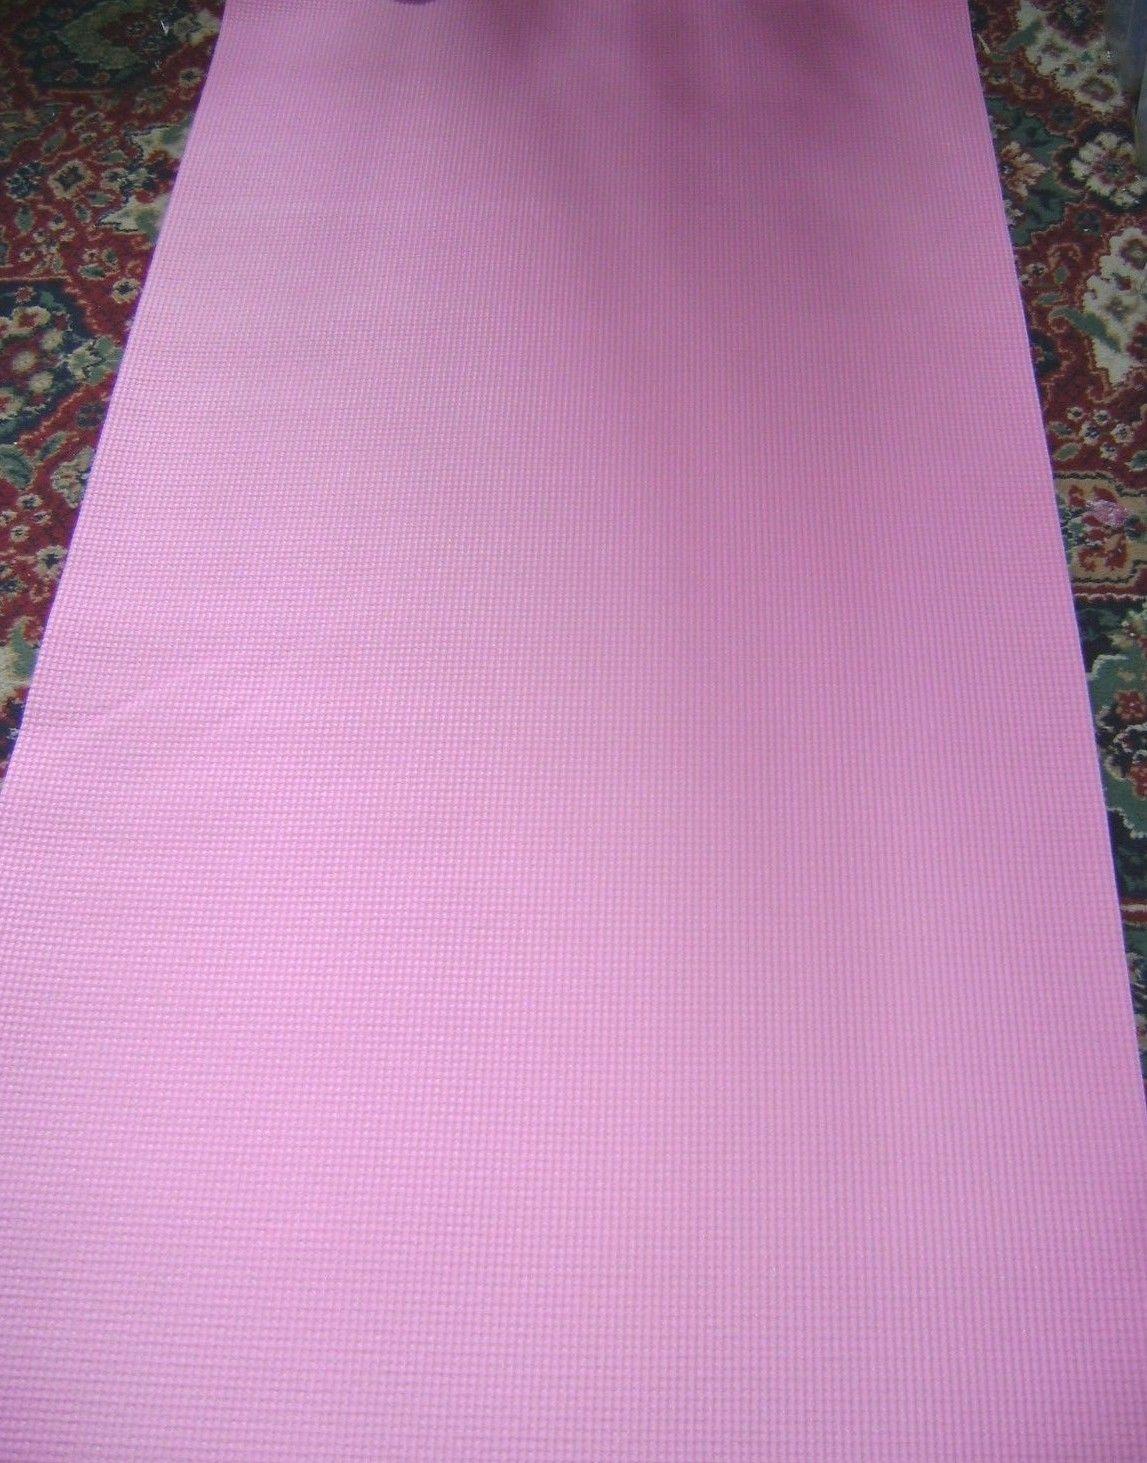 Nuevo-Yoga-Ejercicio-Suave-Esterilla-Acolchada-Antideslizante-Ligero-Azul-o-Rosa miniatura 9